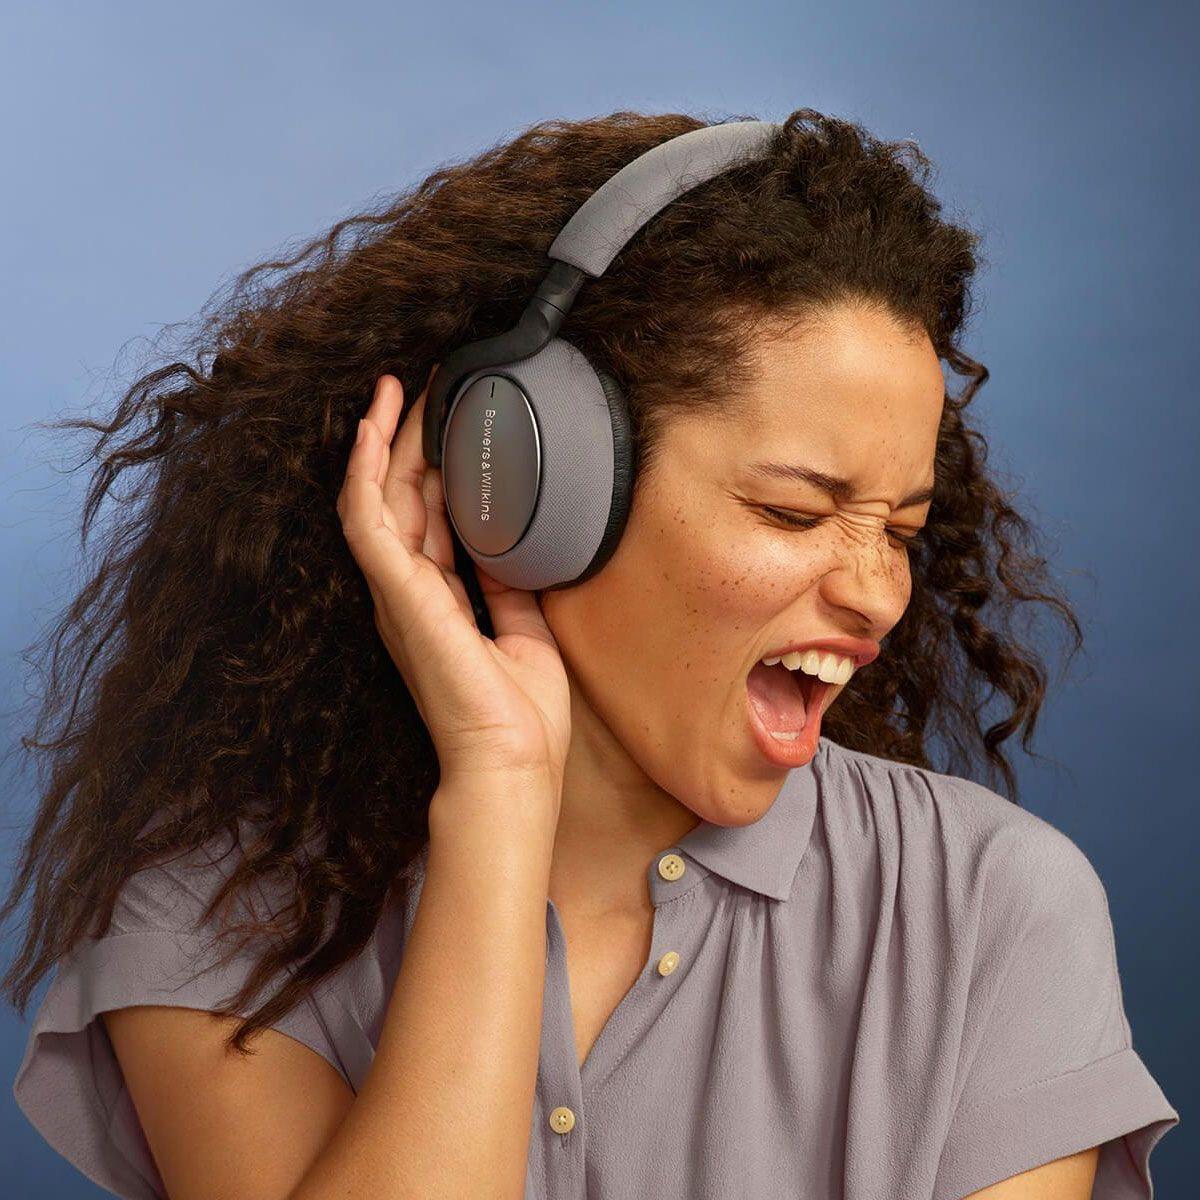 [Lokal]Bowers & Wilkins PX7 kabellose Bluetooth Over-Ear Kopfhörer, Farbe Silber oder Grau, Hirsch+Ille Ludwigshafen/Mannheim